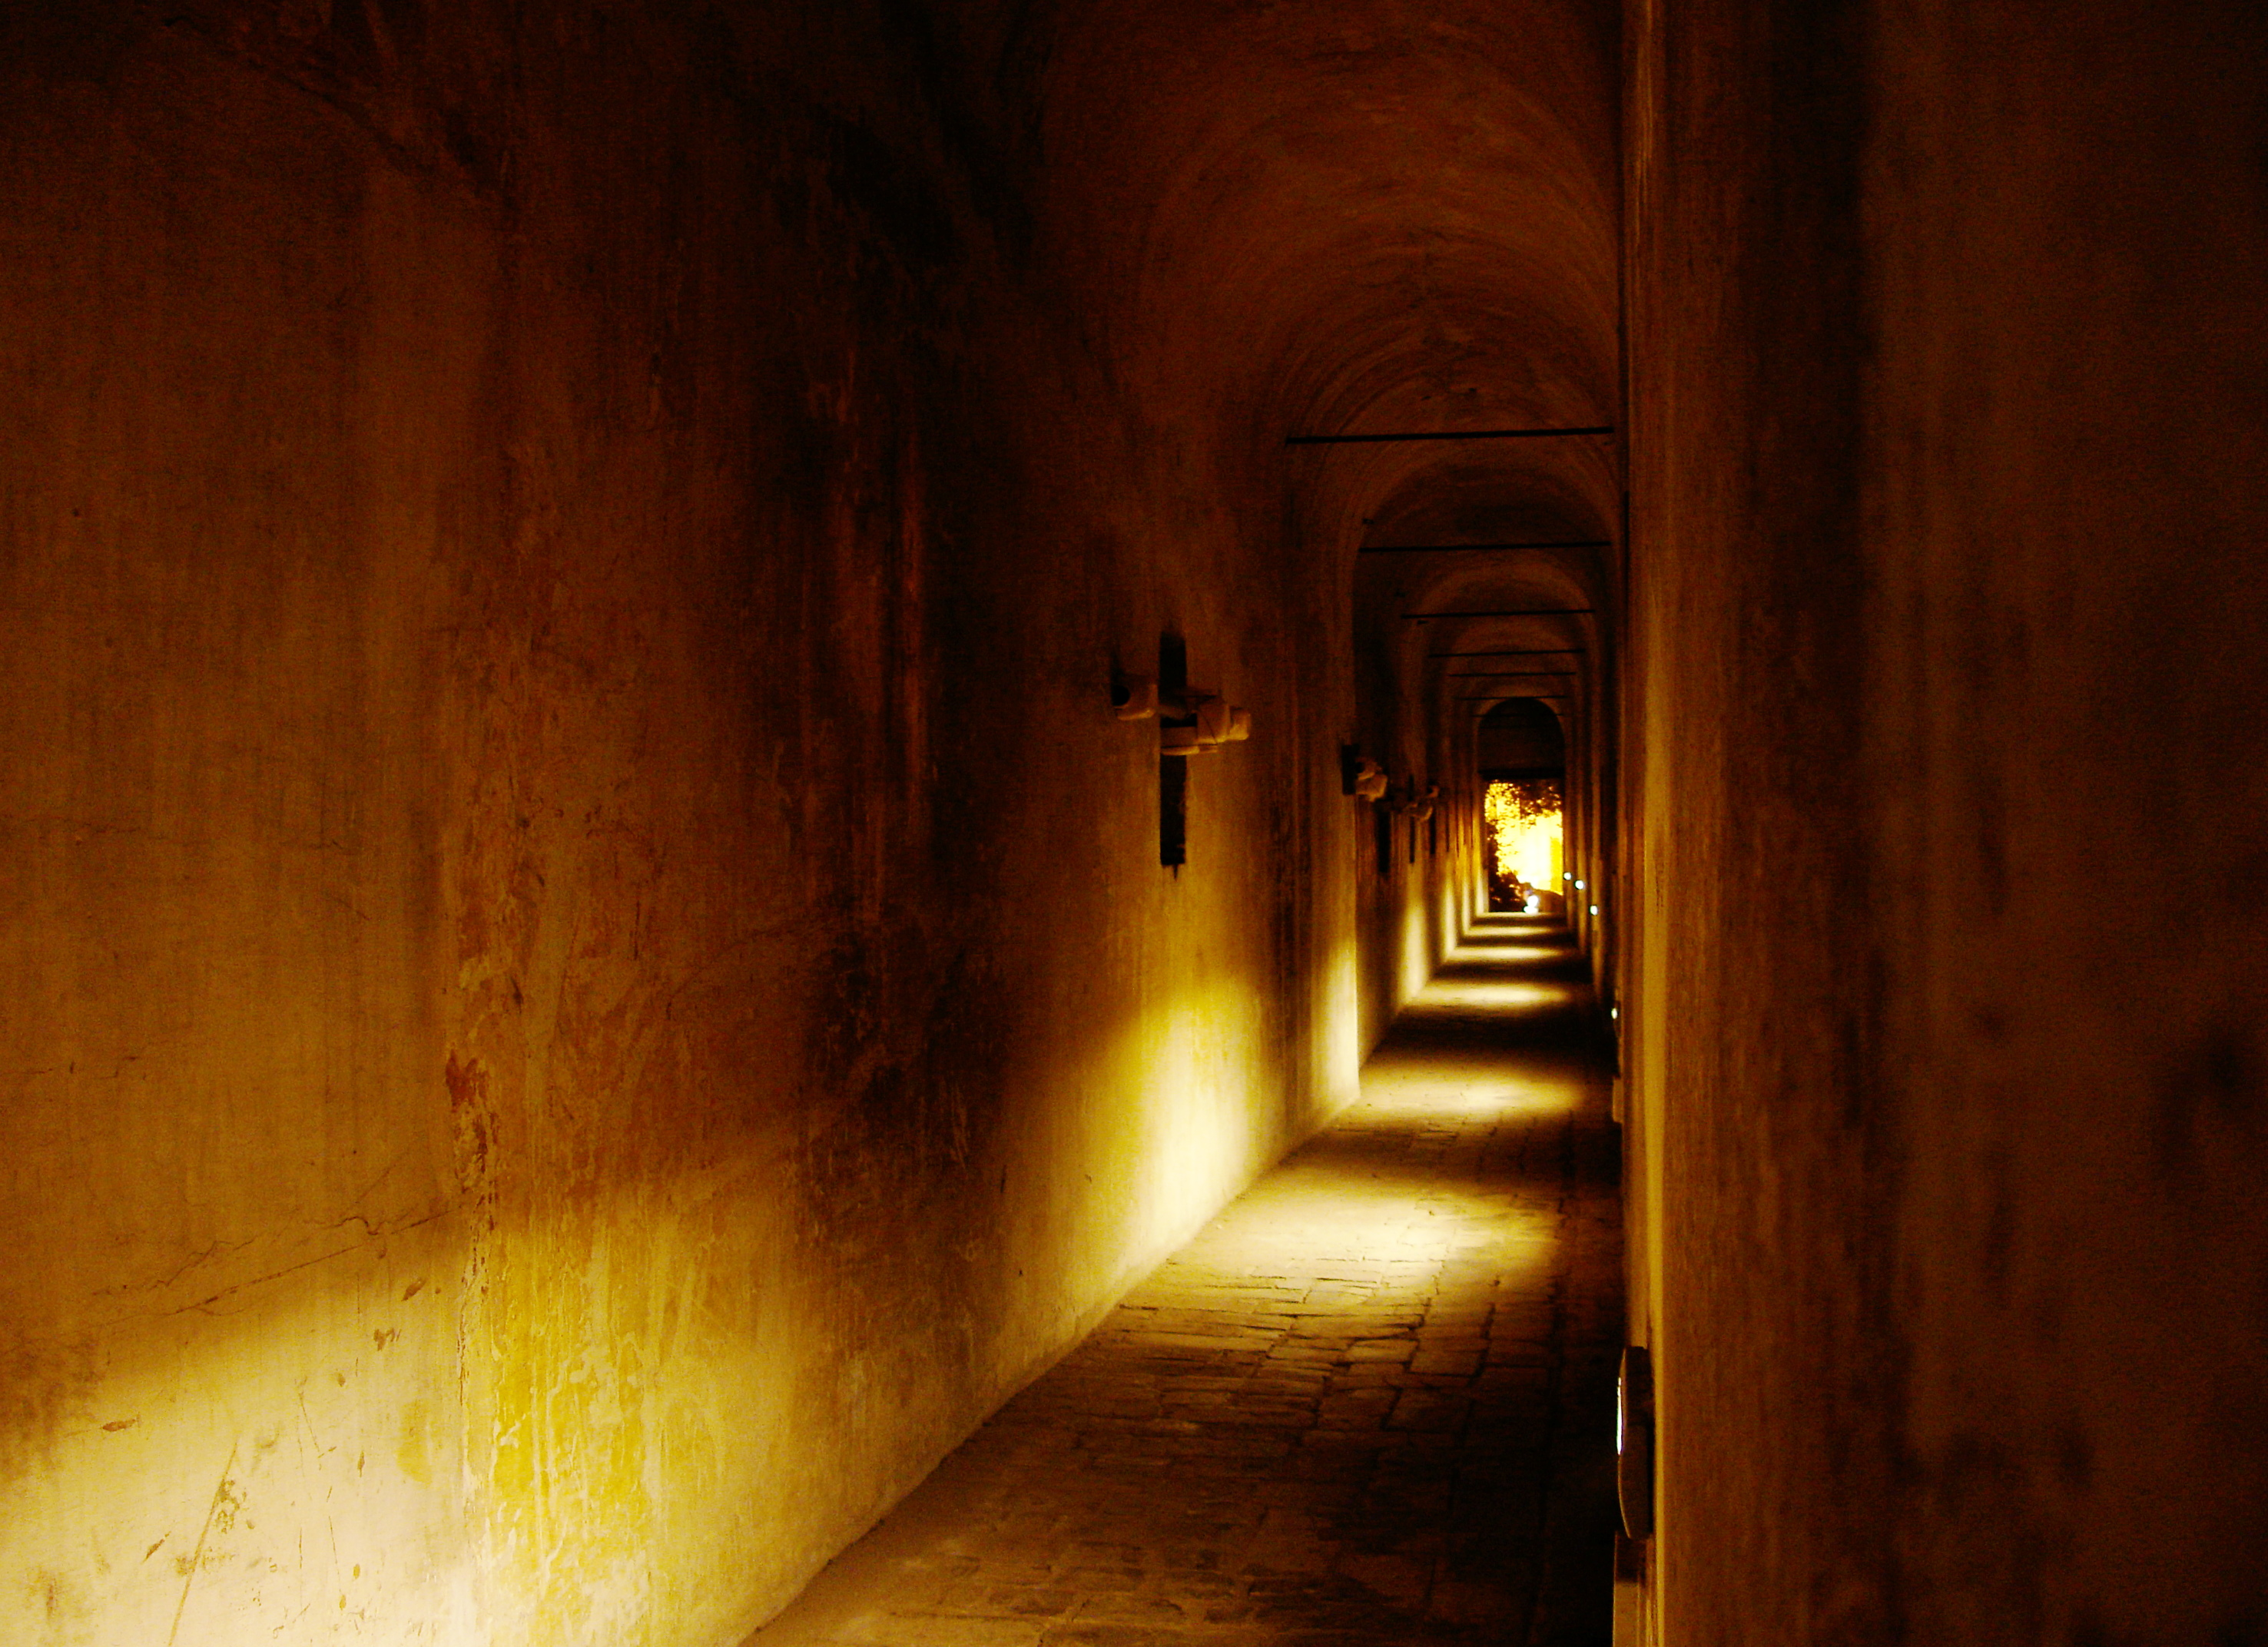 Rome_passetto_night_inside